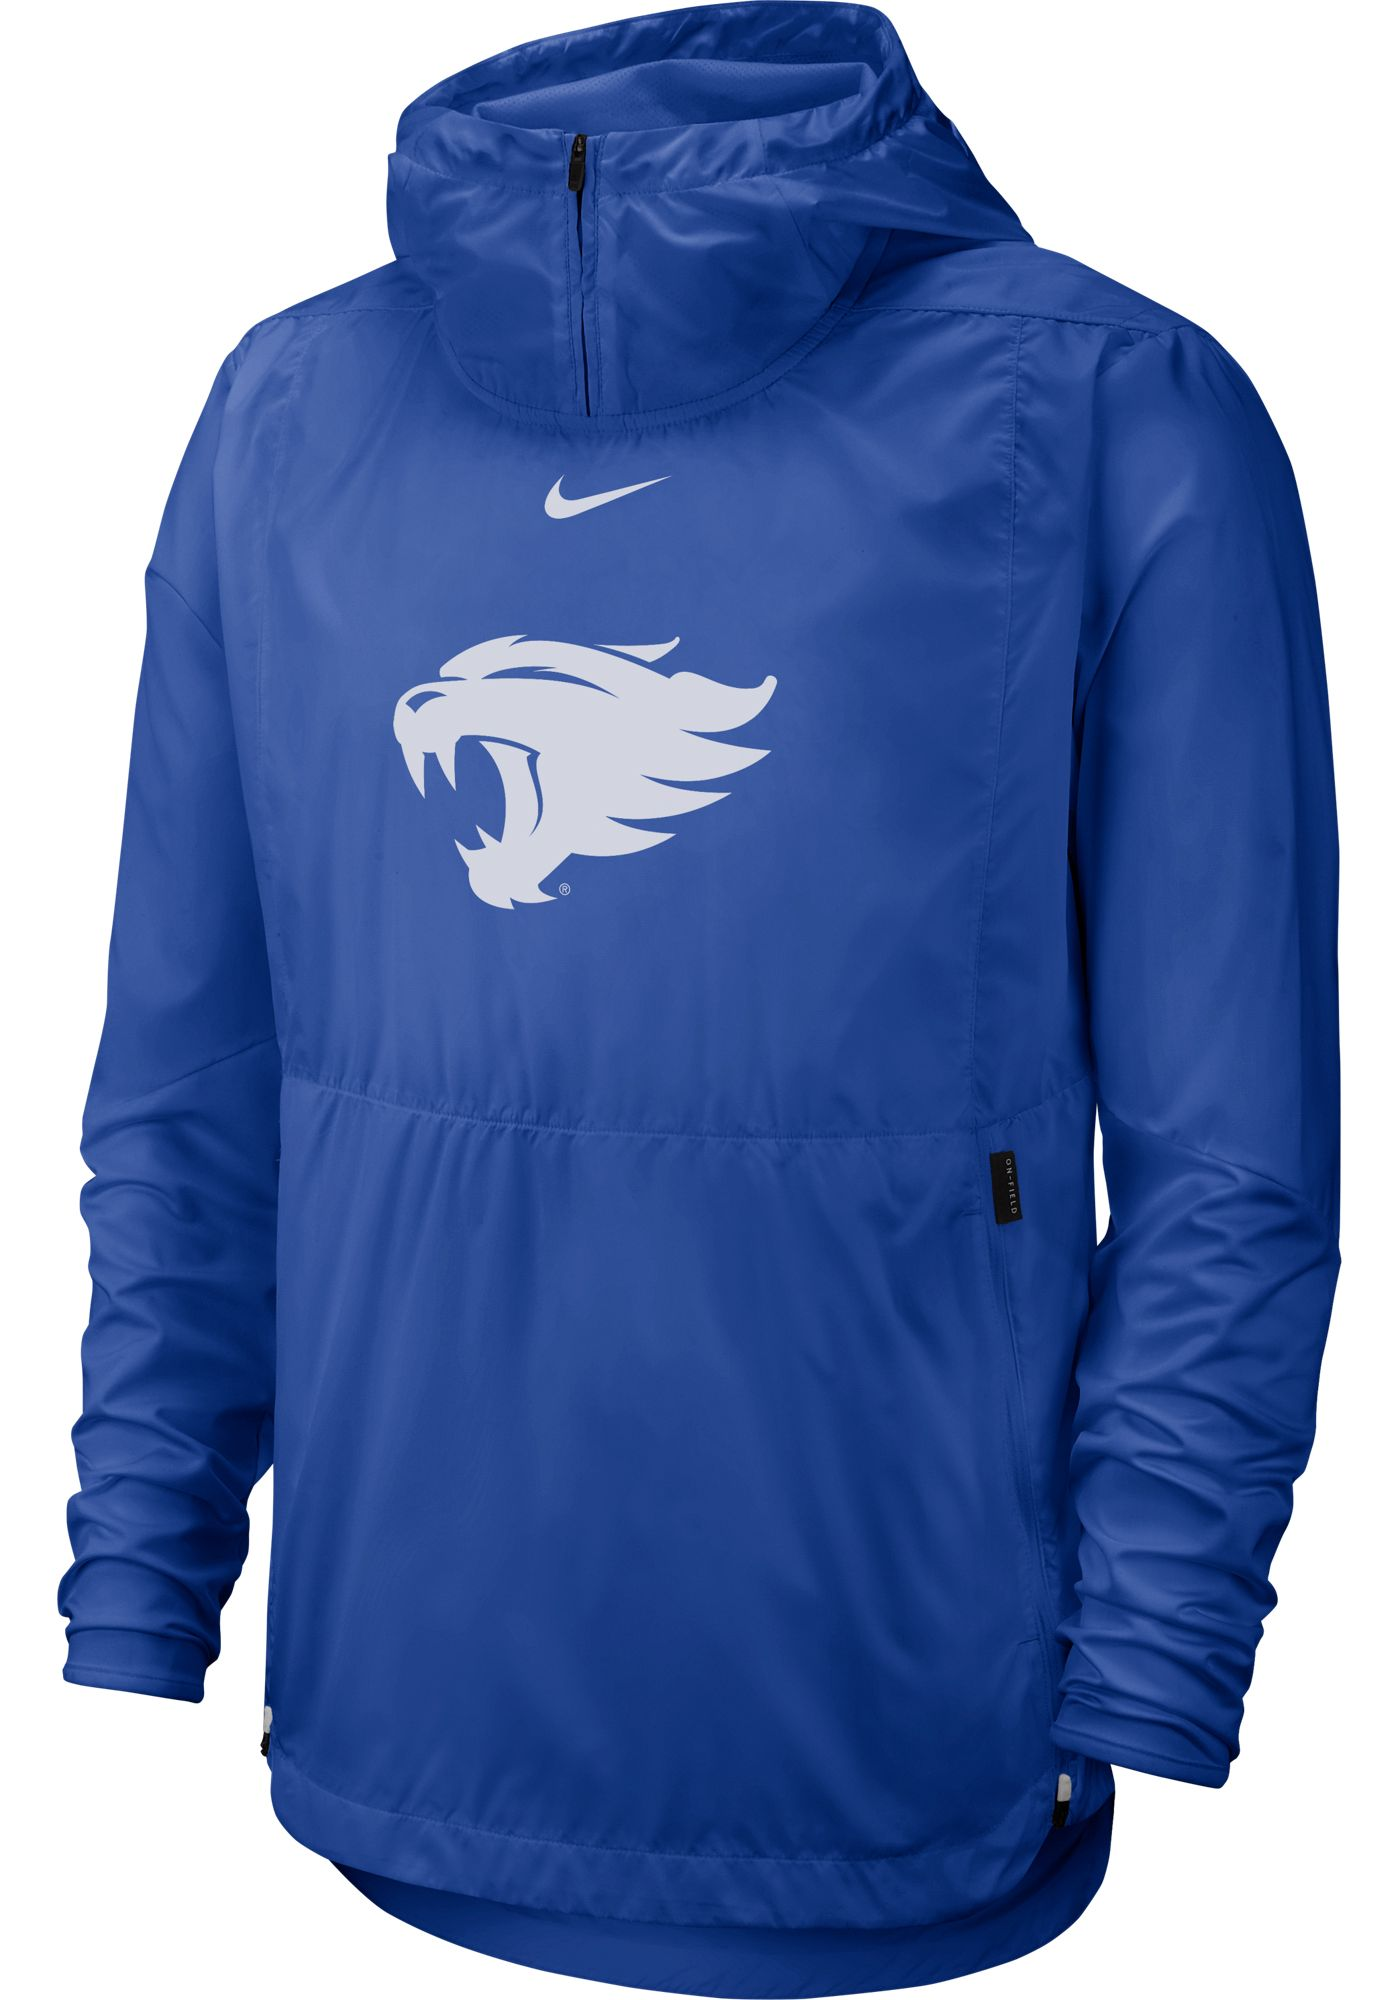 Nike Men's Kentucky Wildcats Blue Repel Football Sideline Player Pullover Hoodie